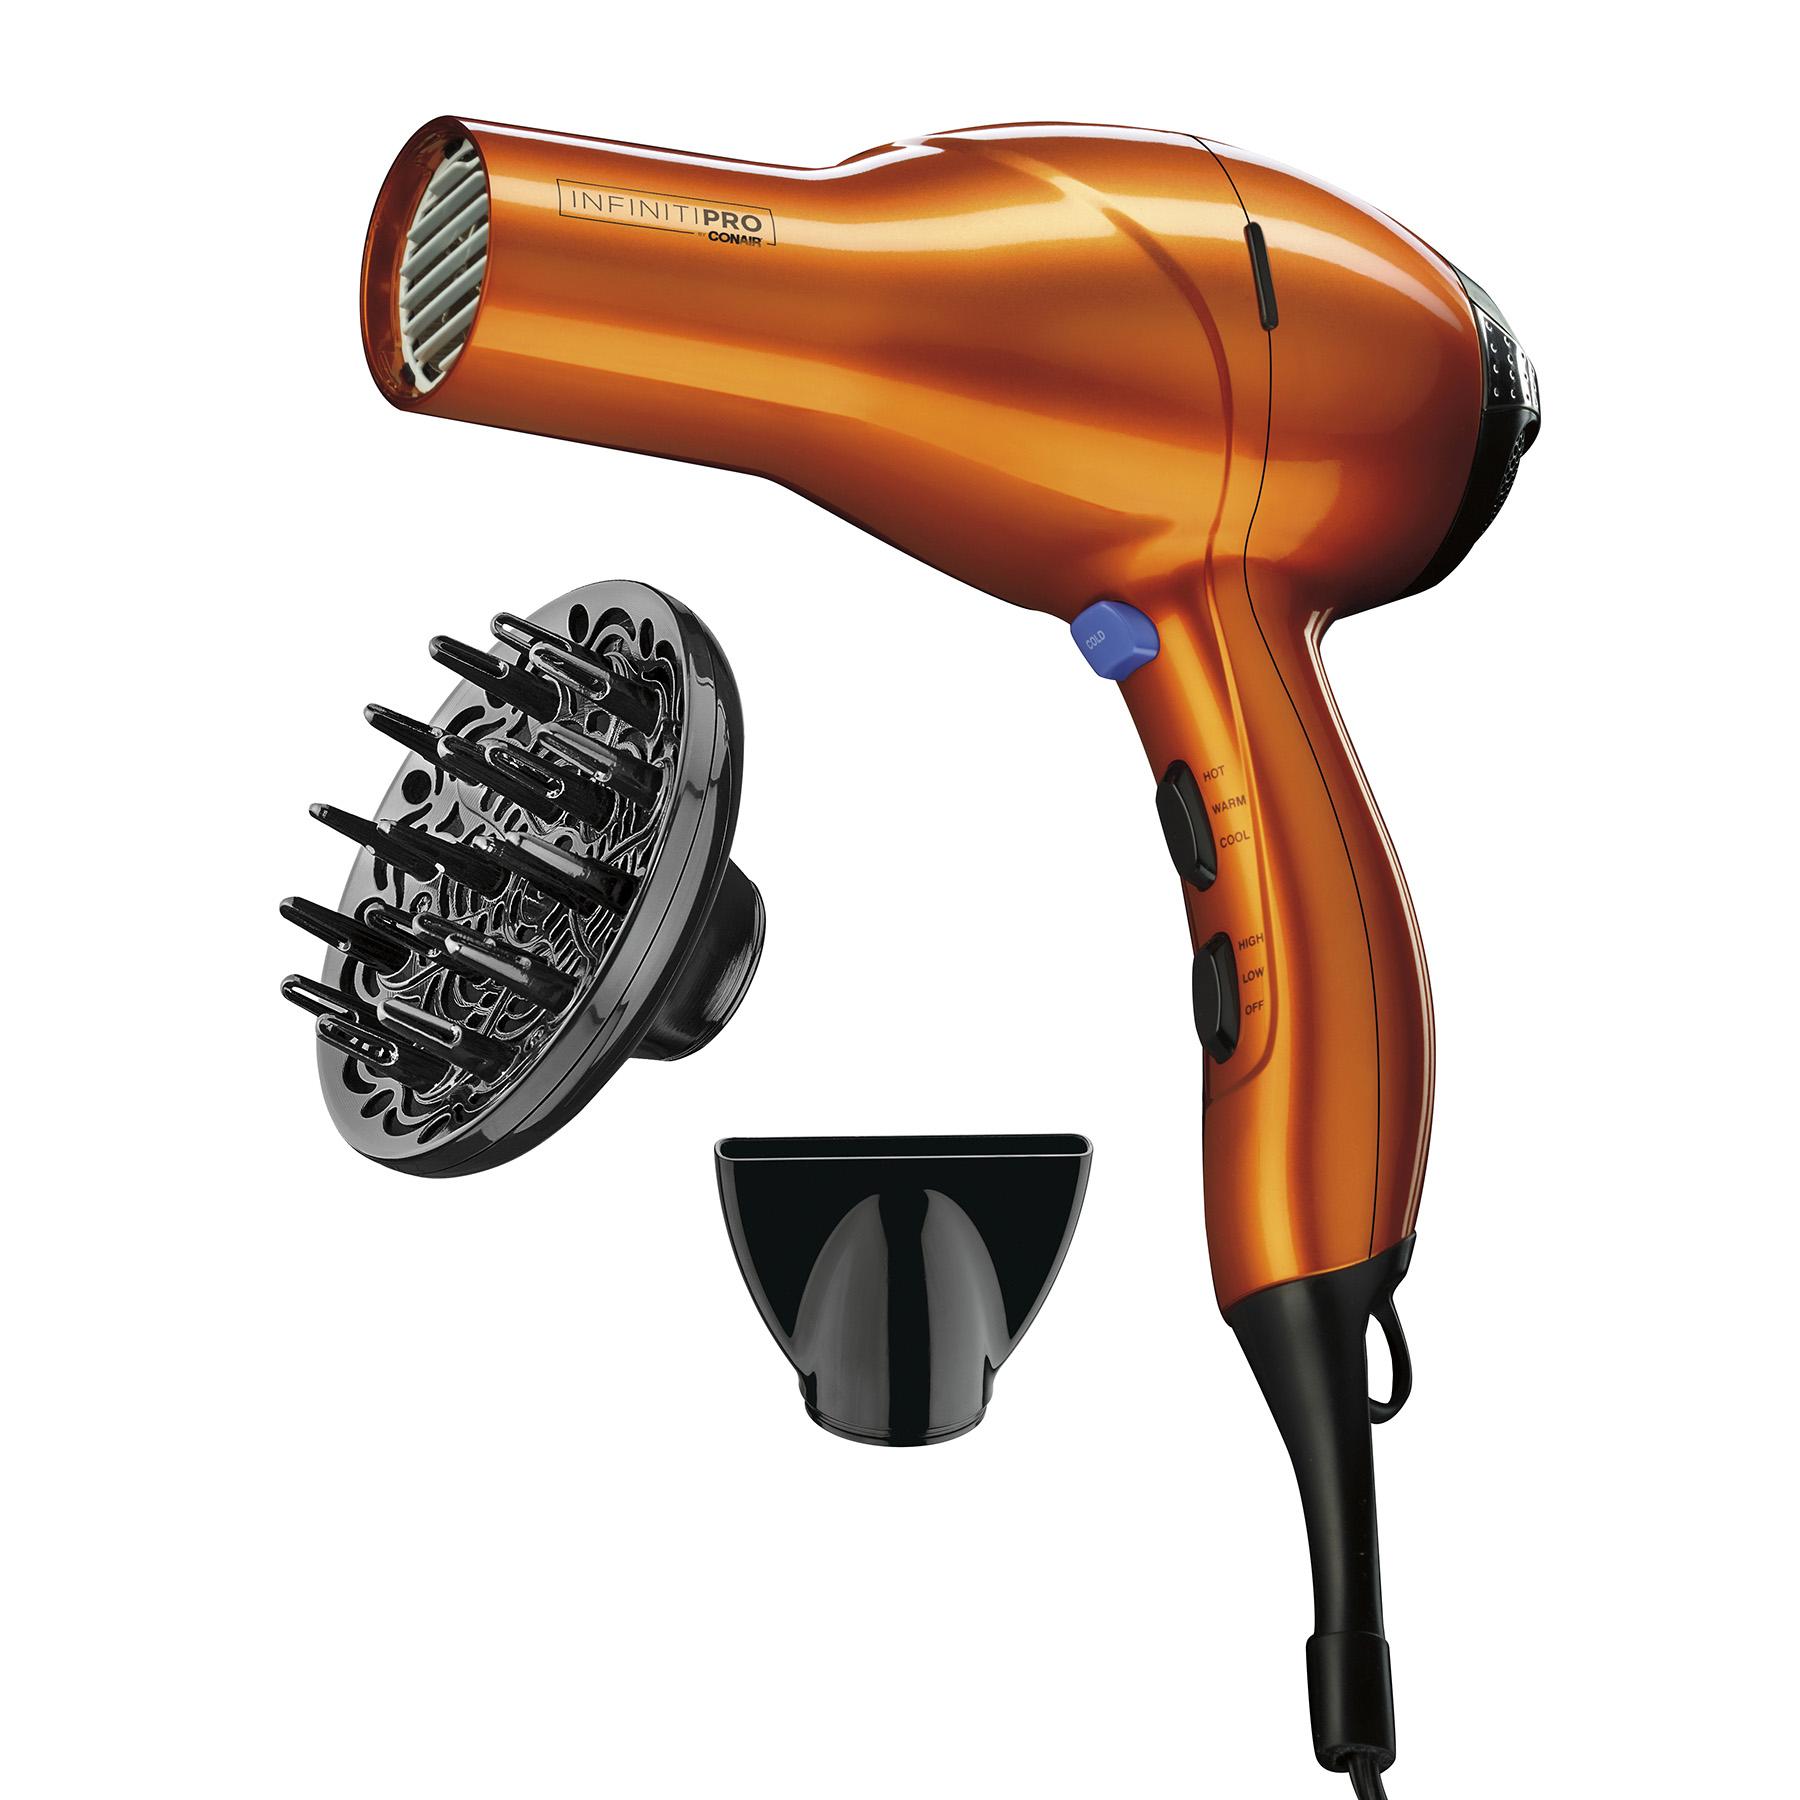 Infiniti Pro by Conair 259TPRY 1875 Watt Styling Tool Blow Dryer; Orange